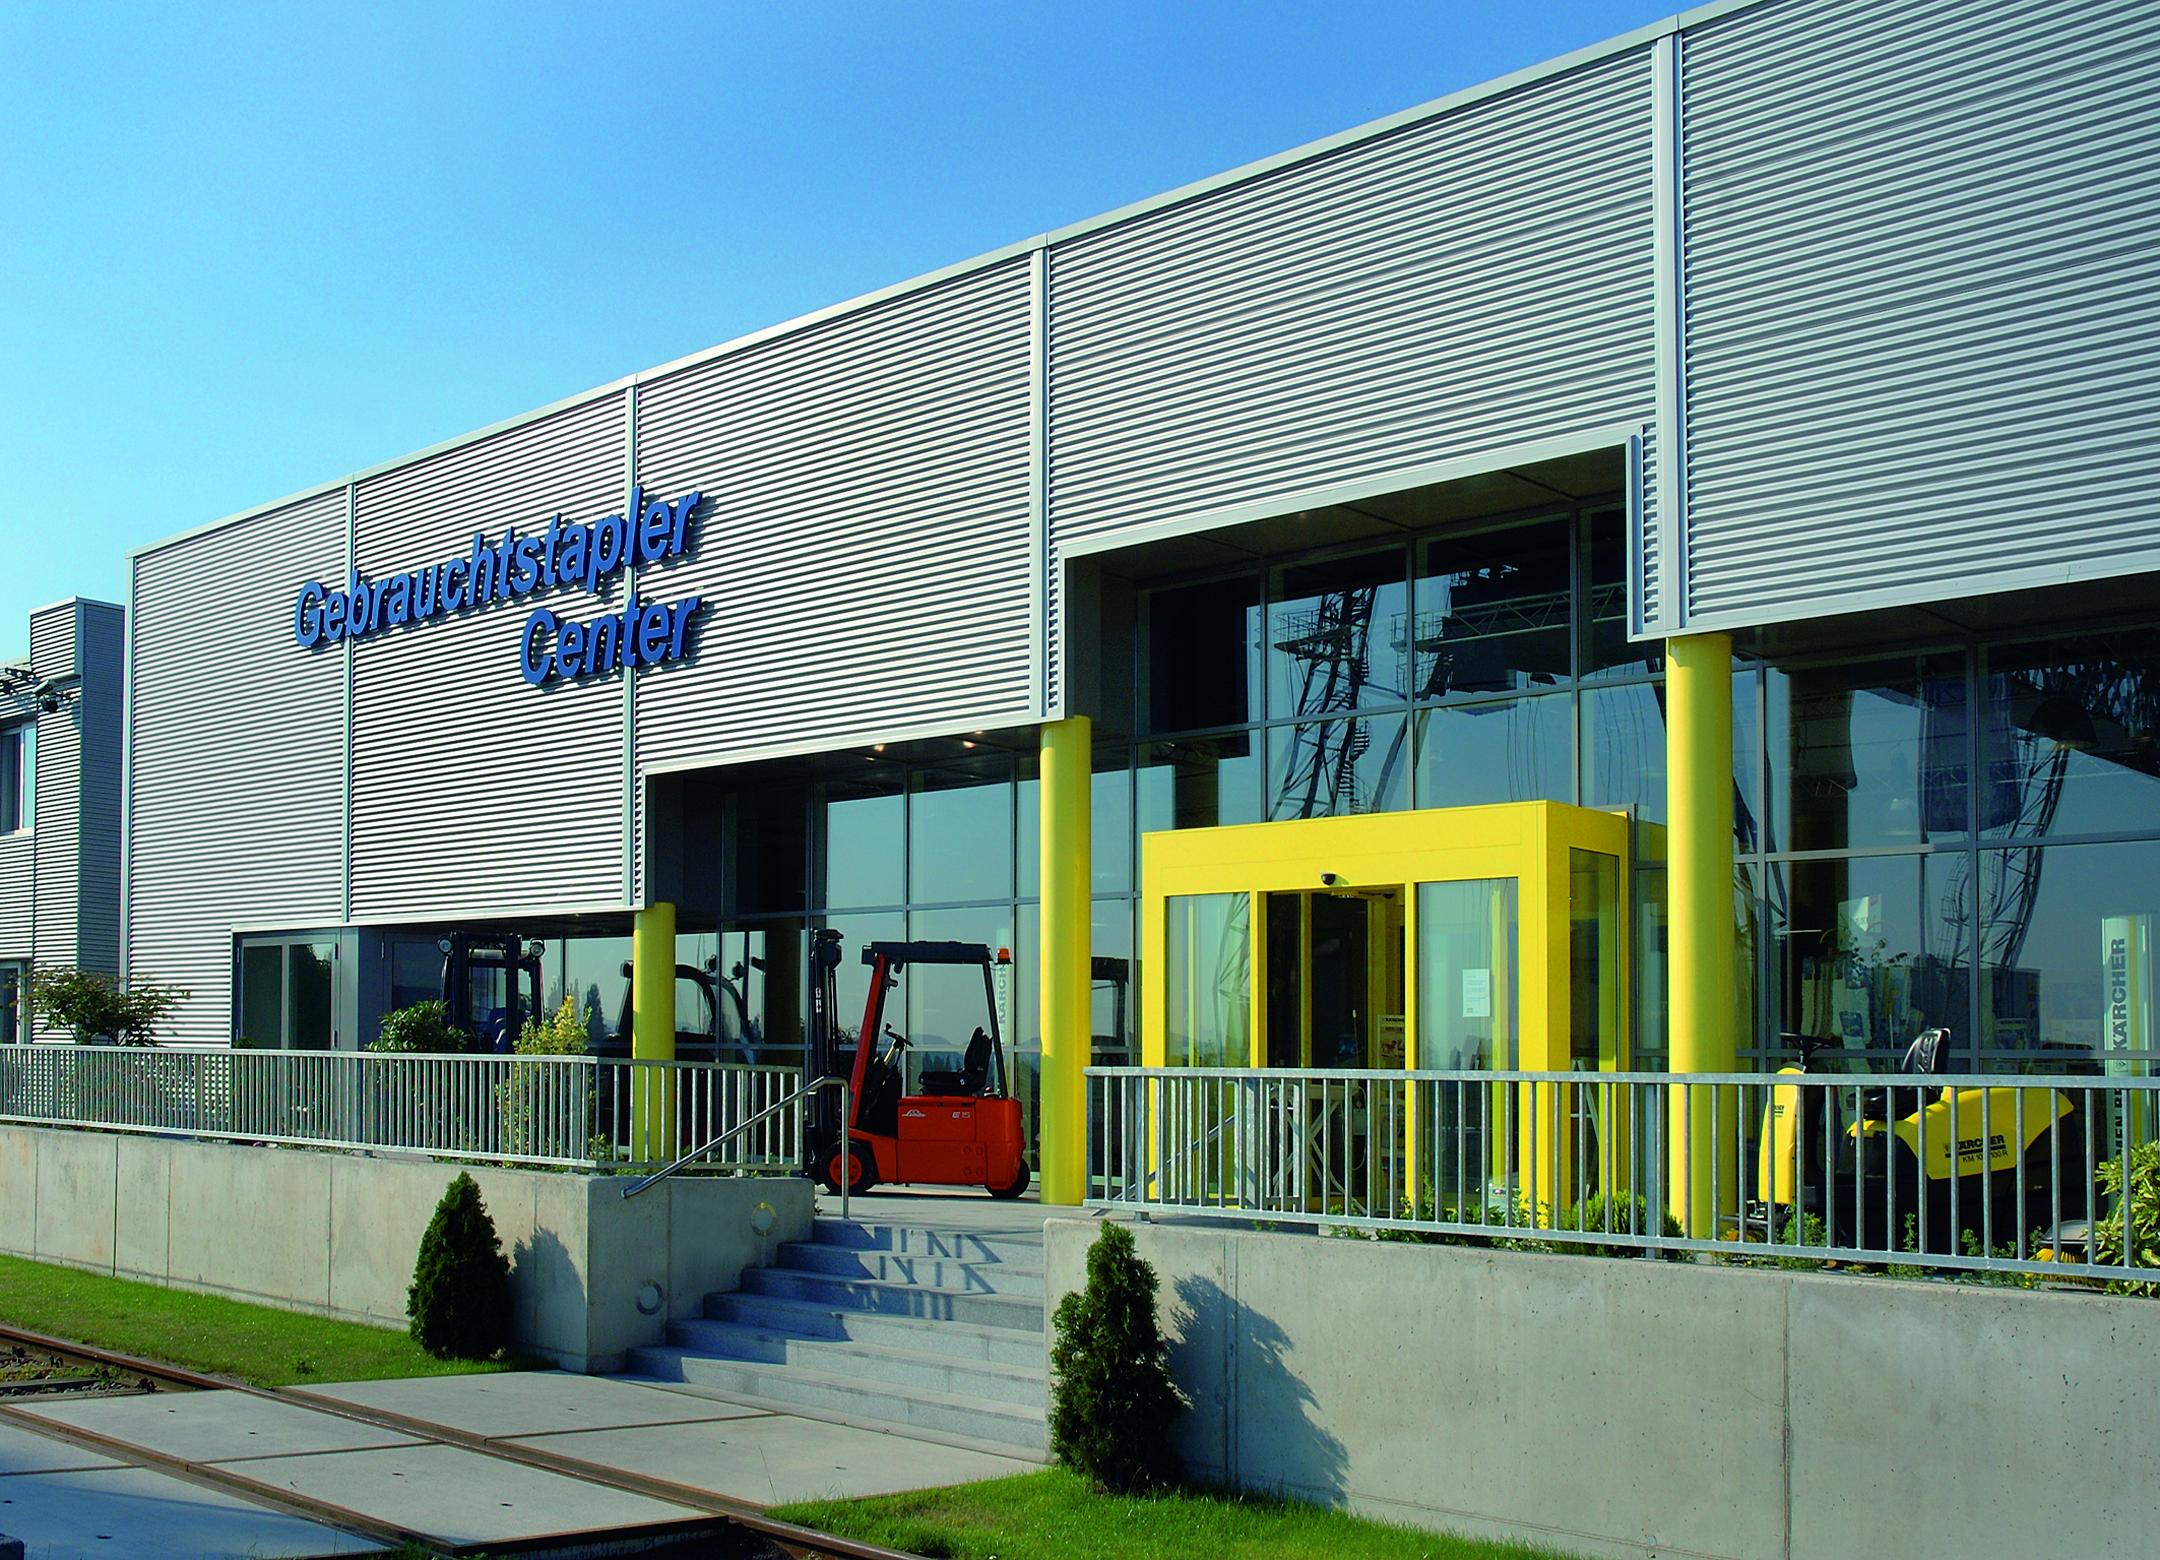 Suffel Fördertechnik GmbH & Co. KG